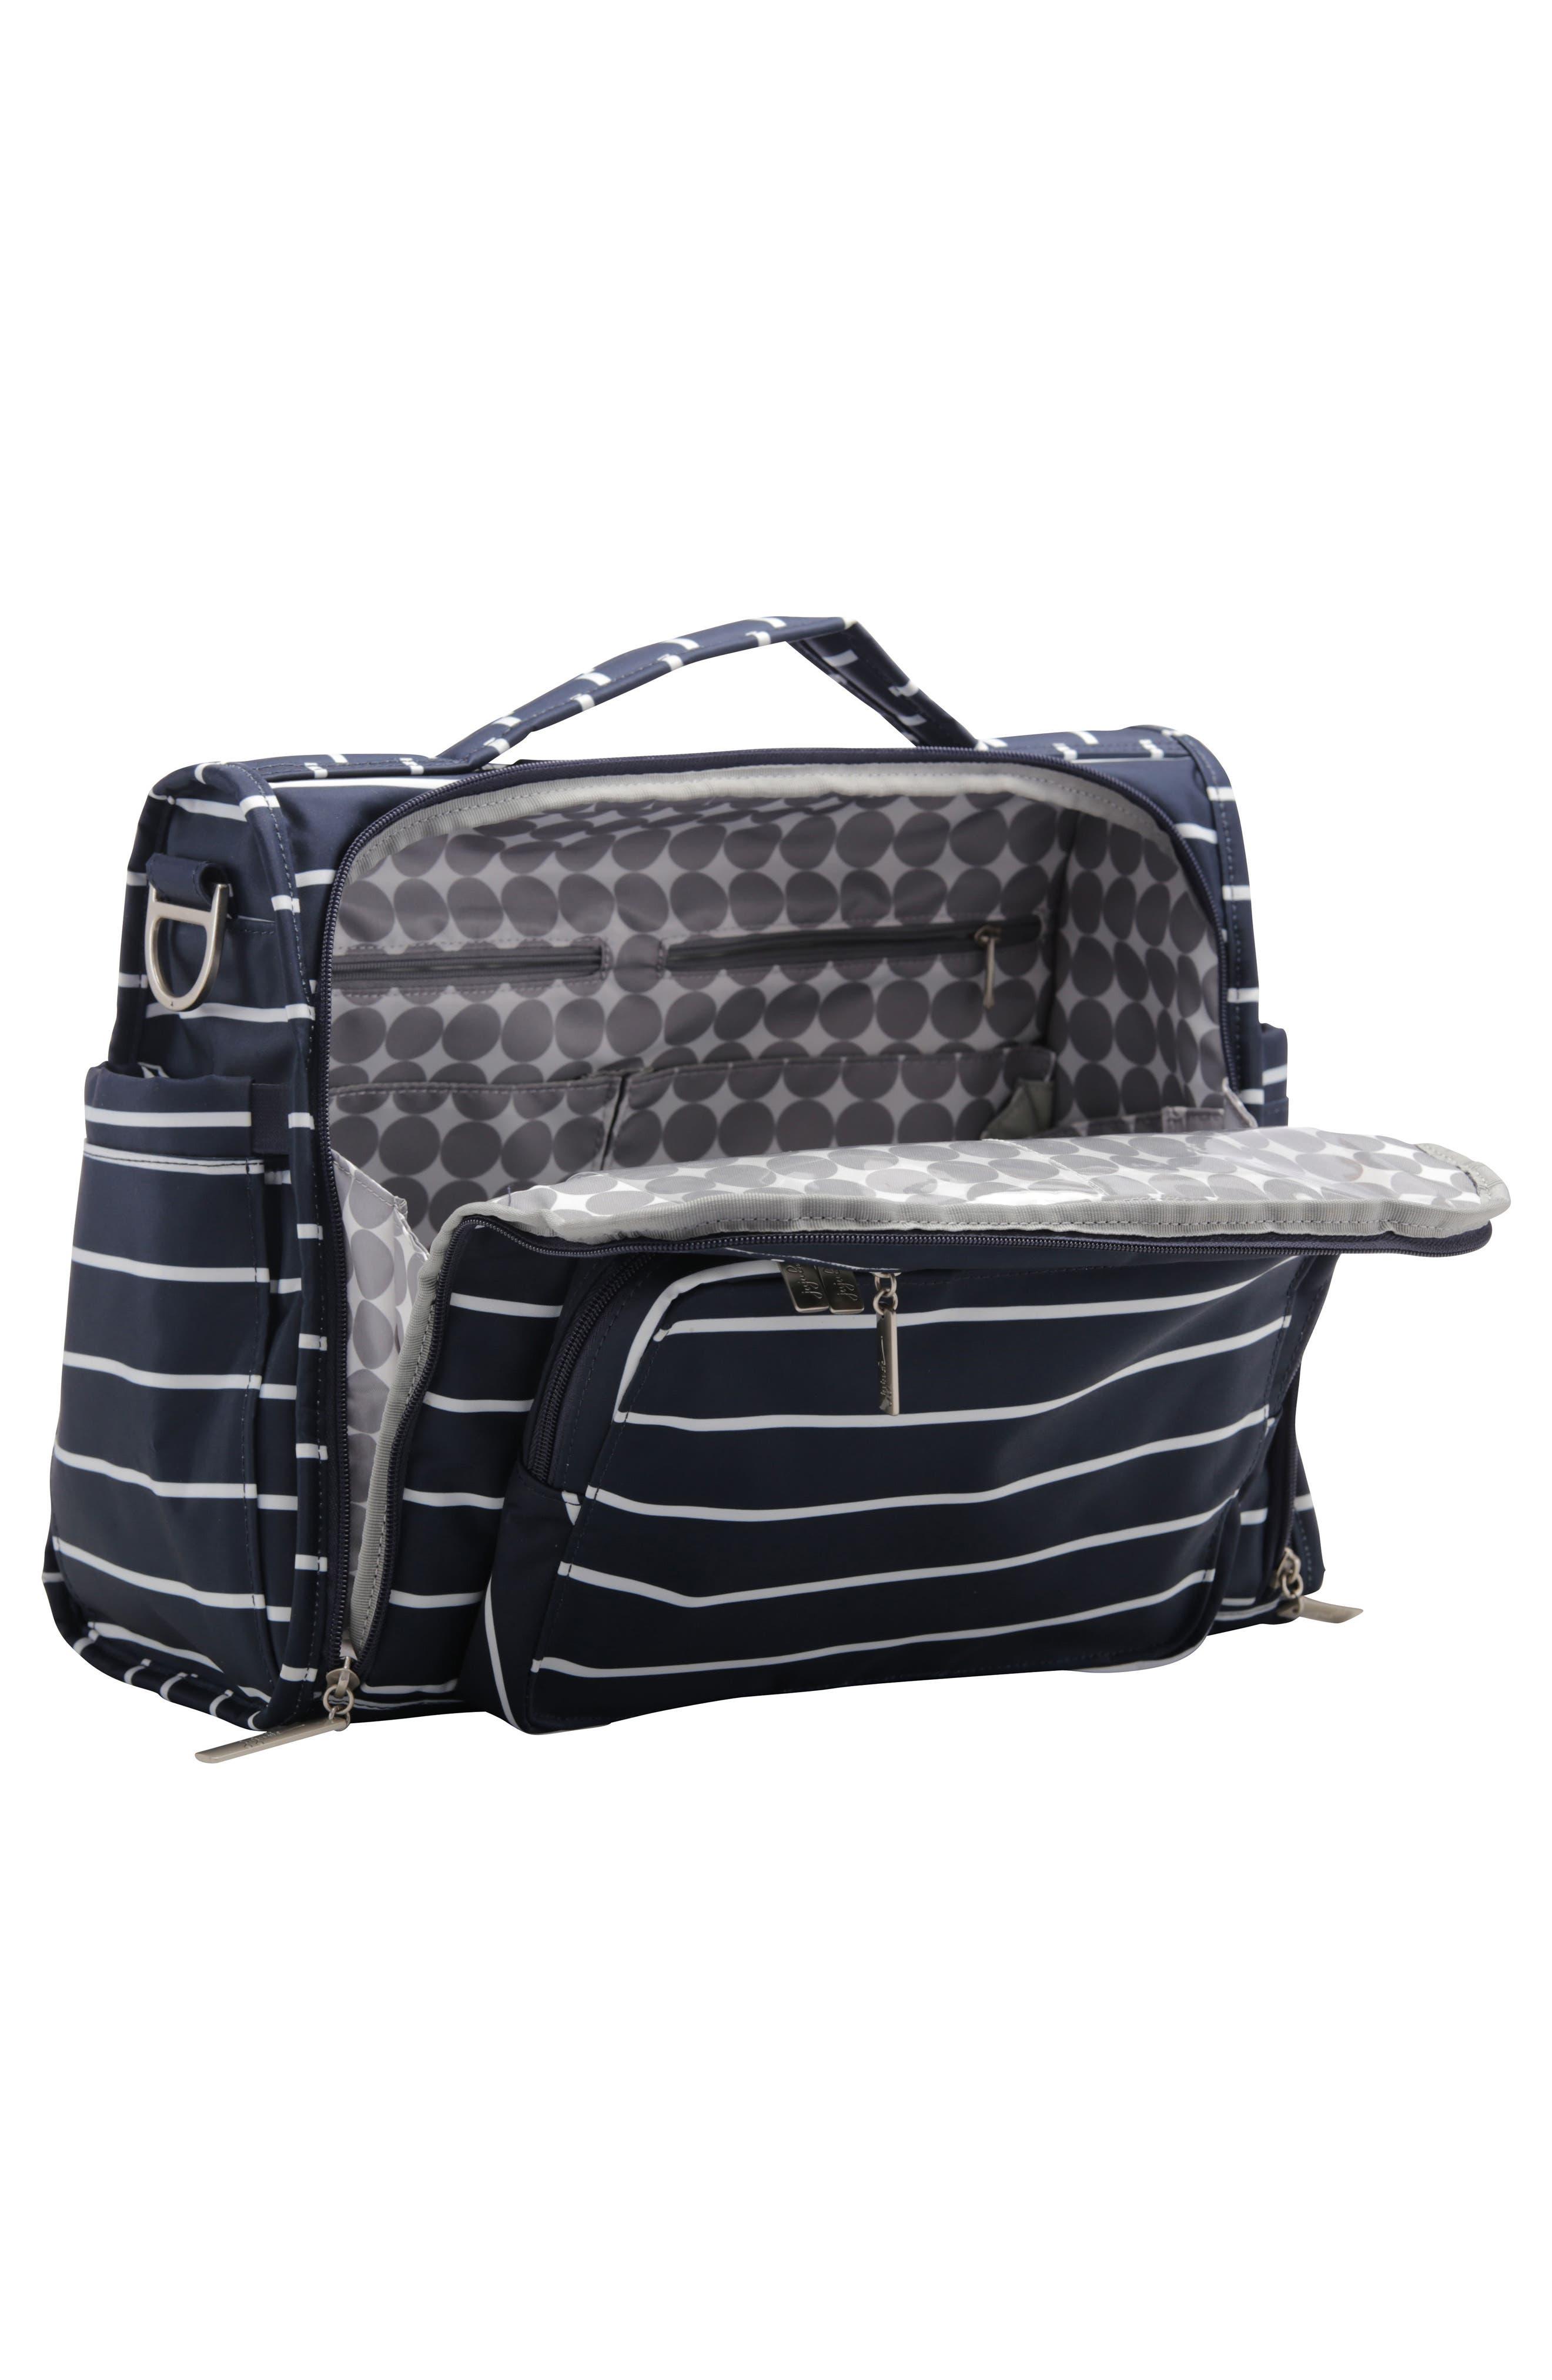 BFF - Coastal Collection Diaper Bag,                             Alternate thumbnail 18, color,